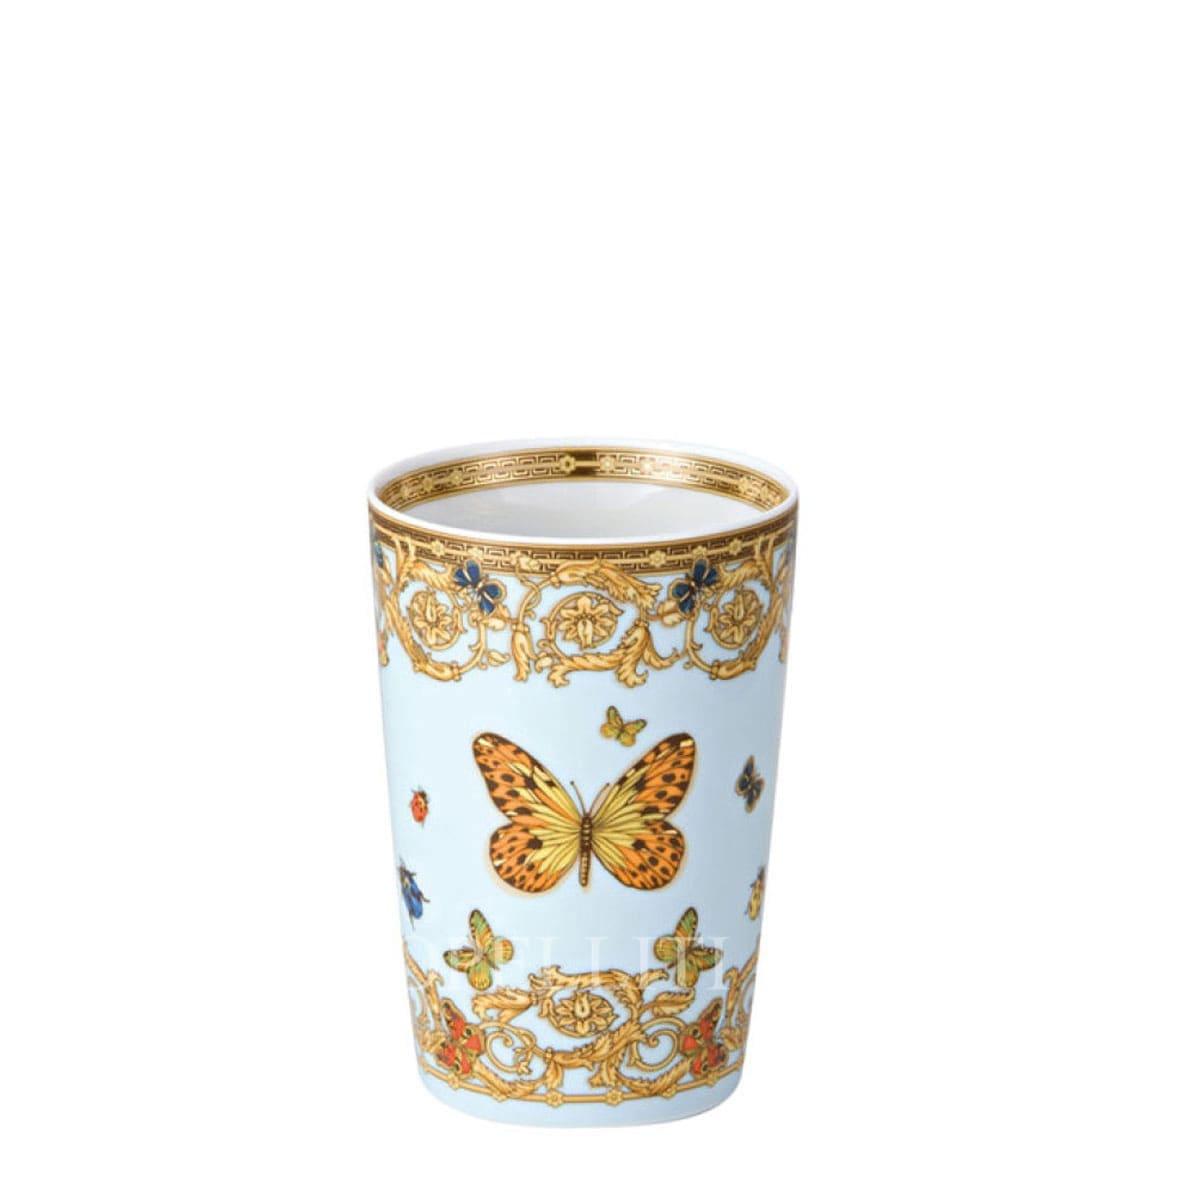 Versace Le jardin de Versace Mug without handles 12 cm by Rosenthal